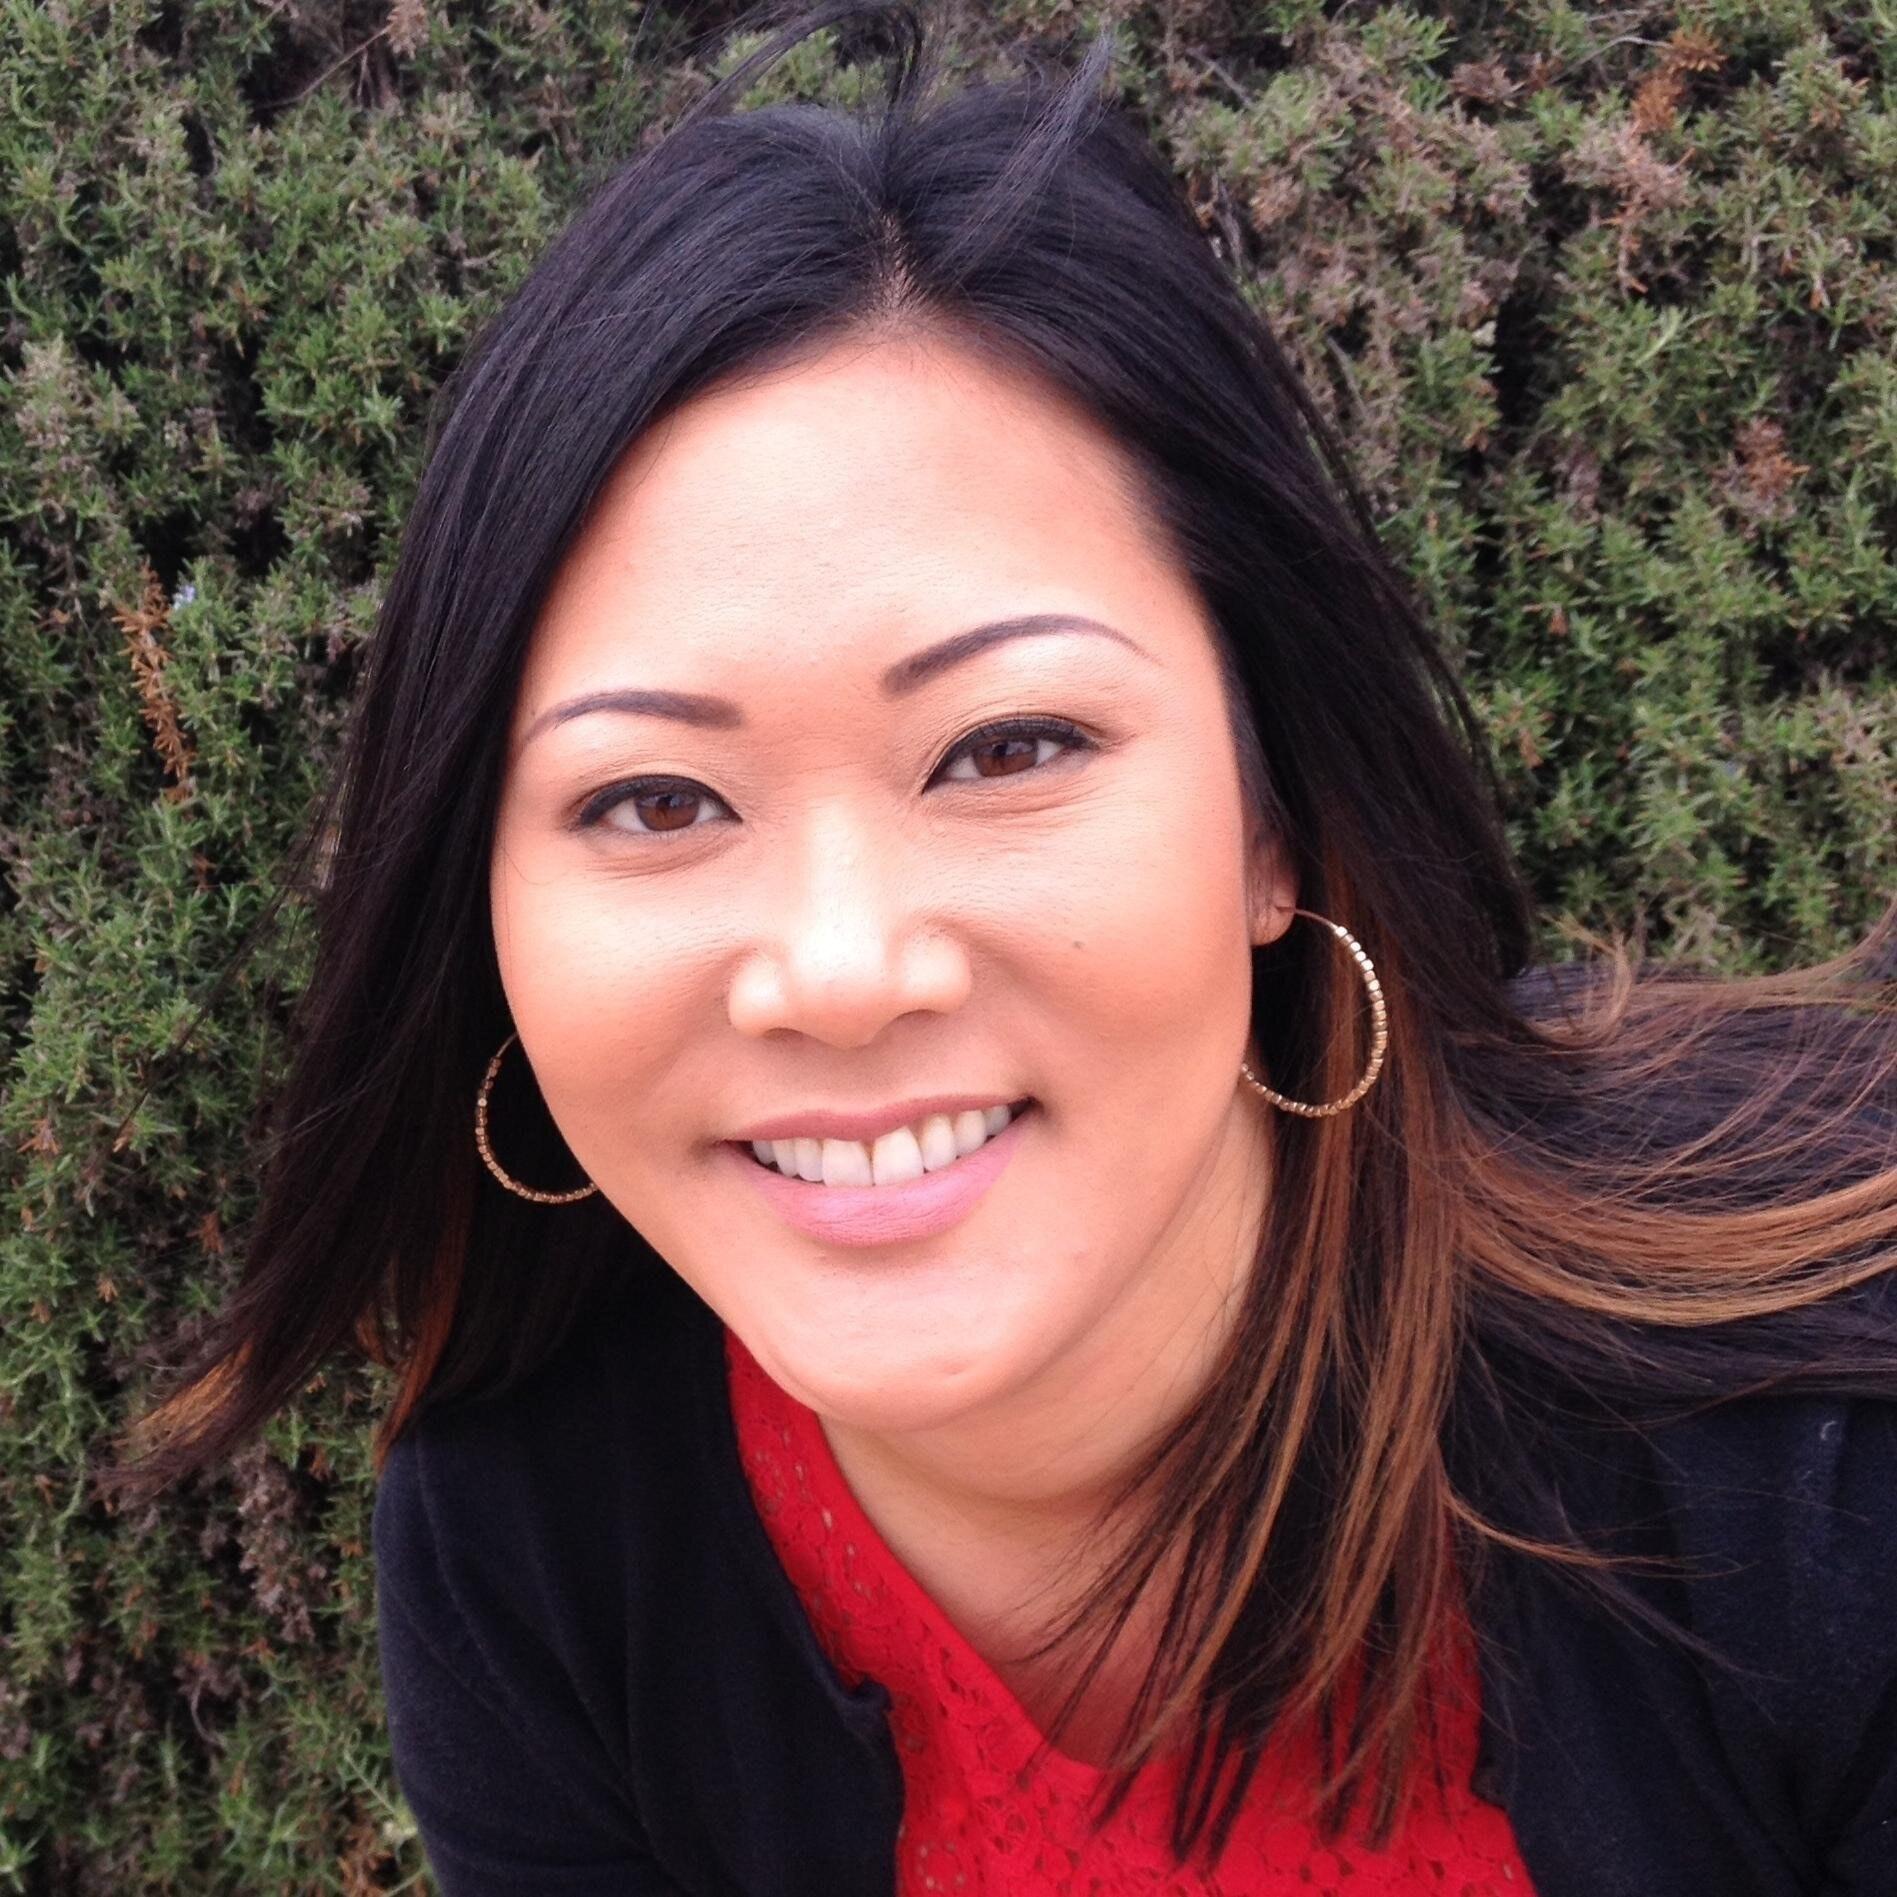 Amy Truong